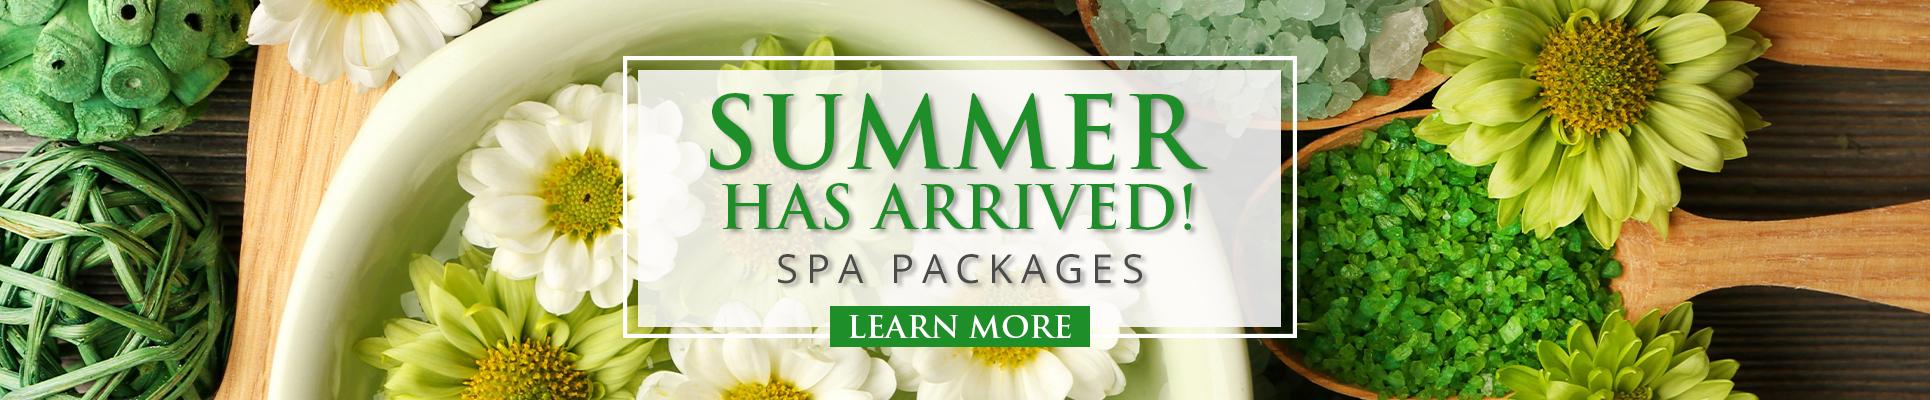 Spa Summer Special